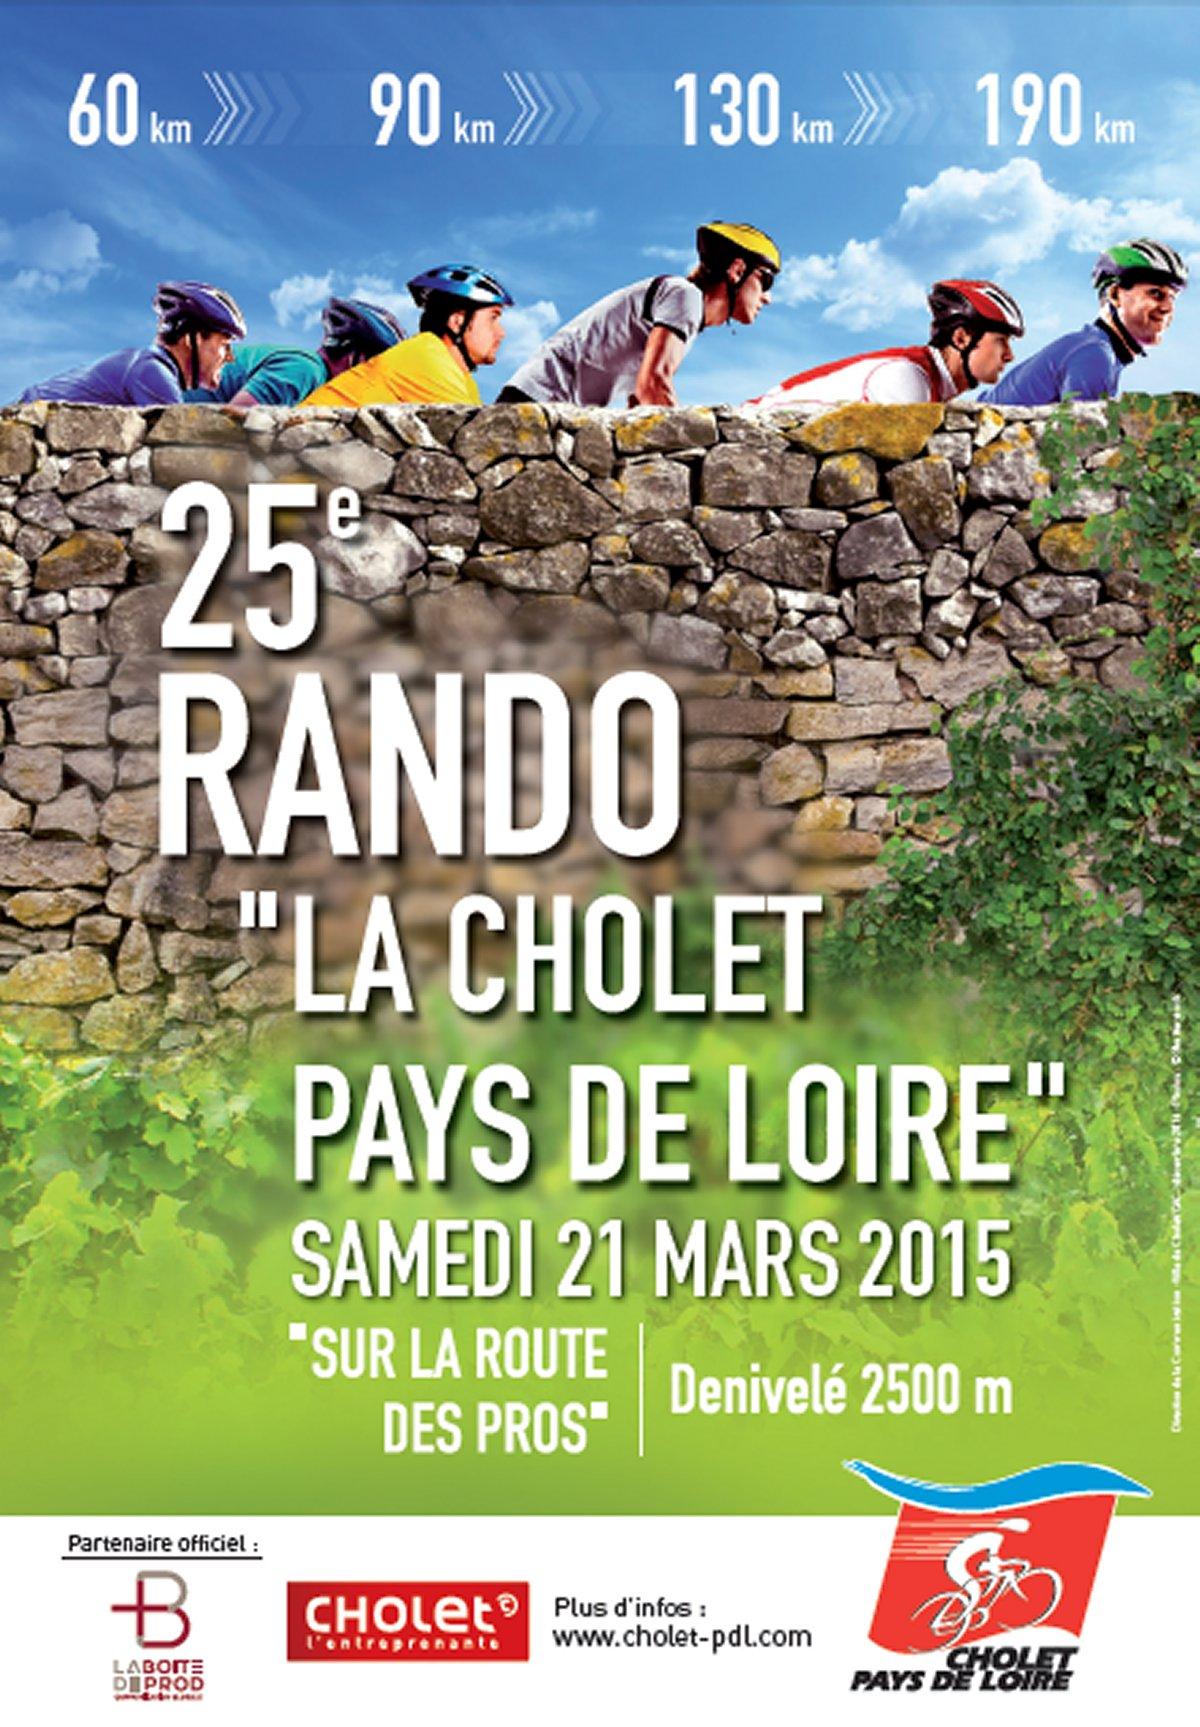 Cholet2